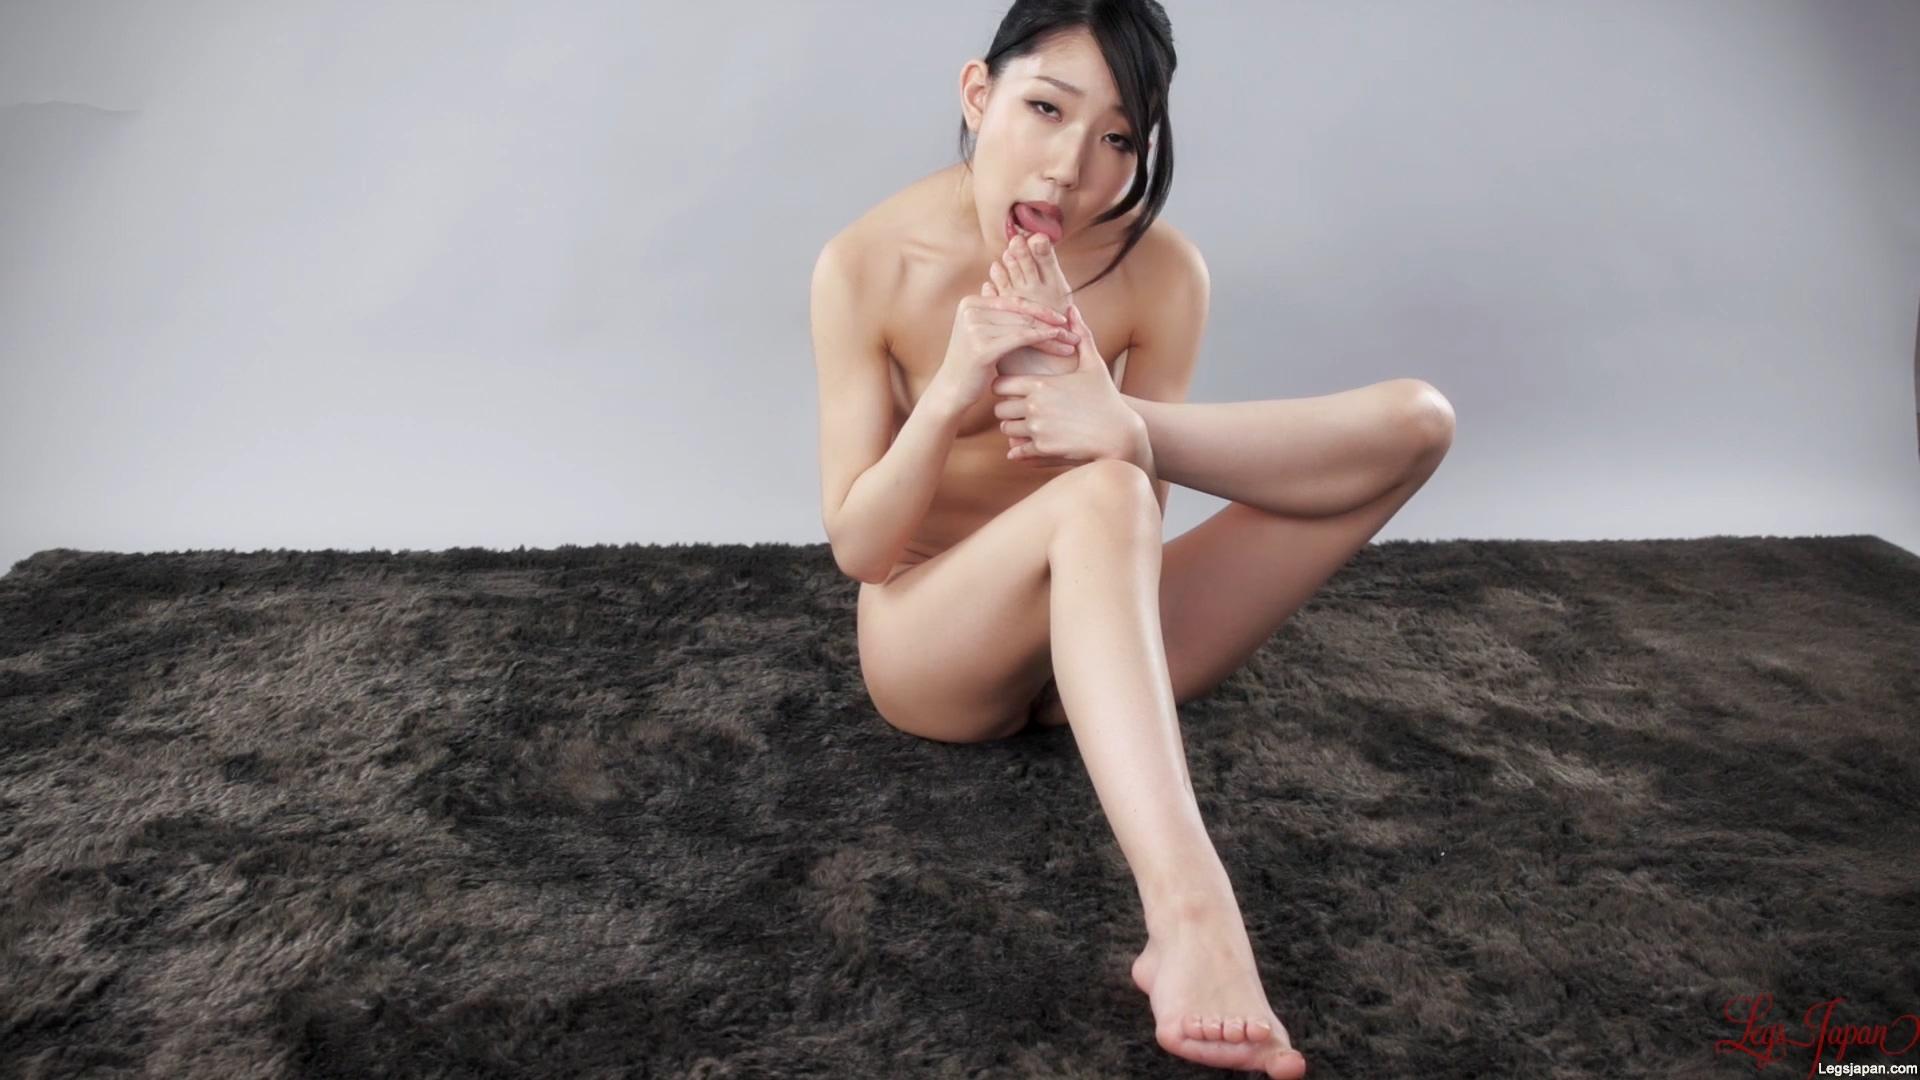 524qrxtr_legs_japan_mp4_20190508_084629_510.jpg